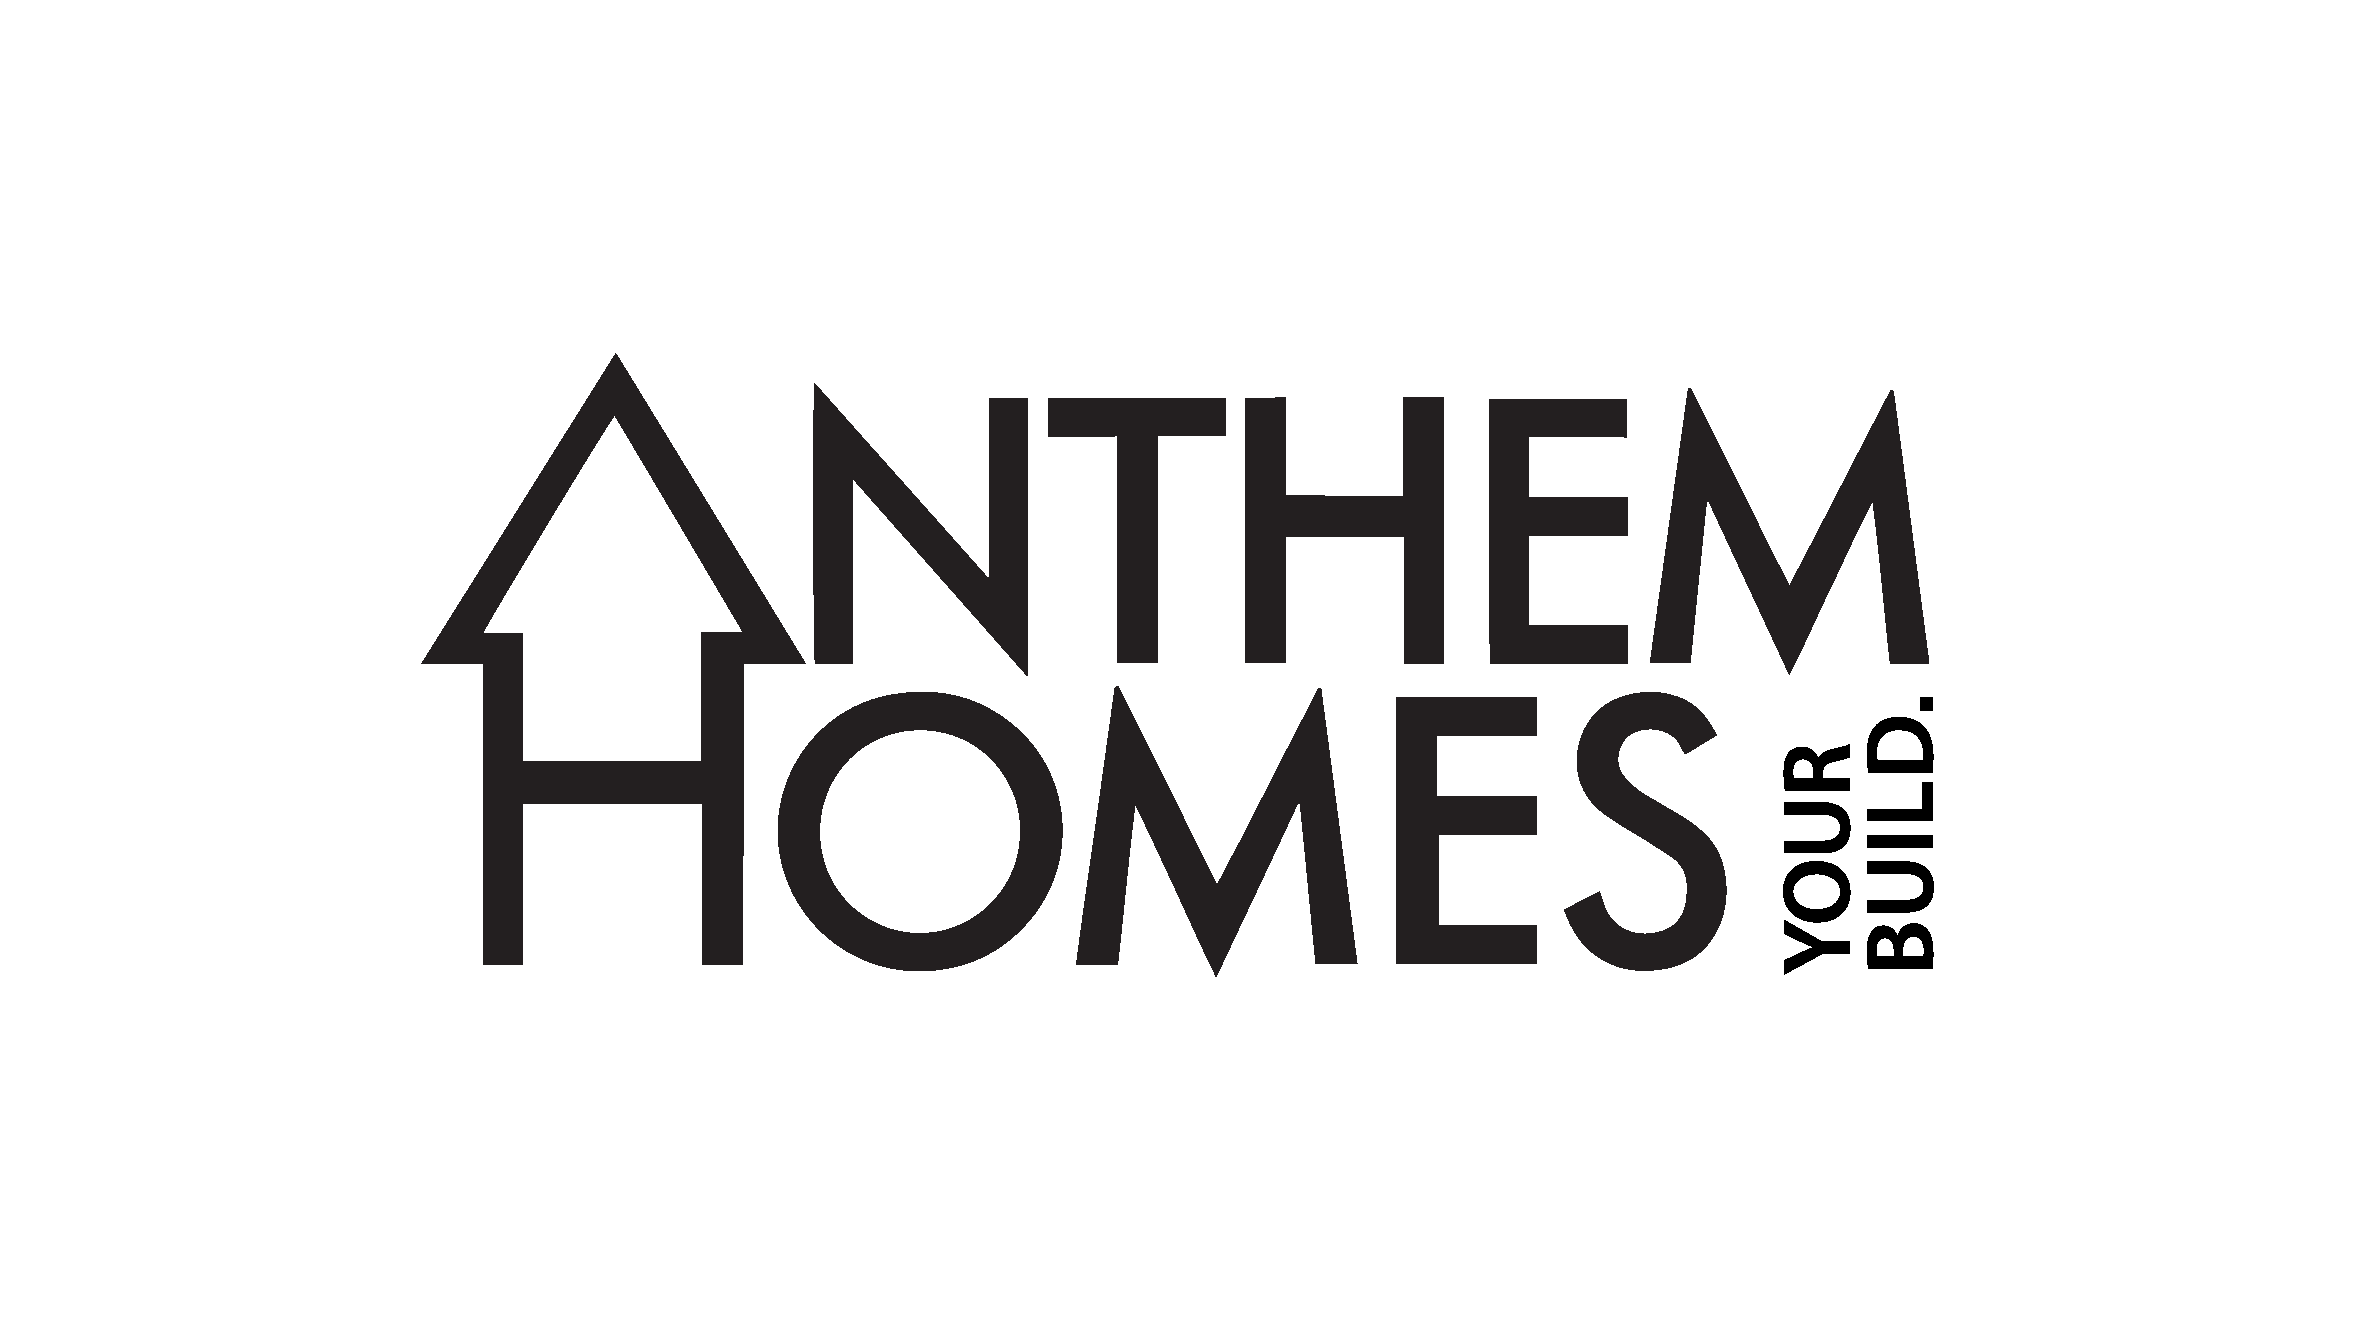 Anthem Homes Limited